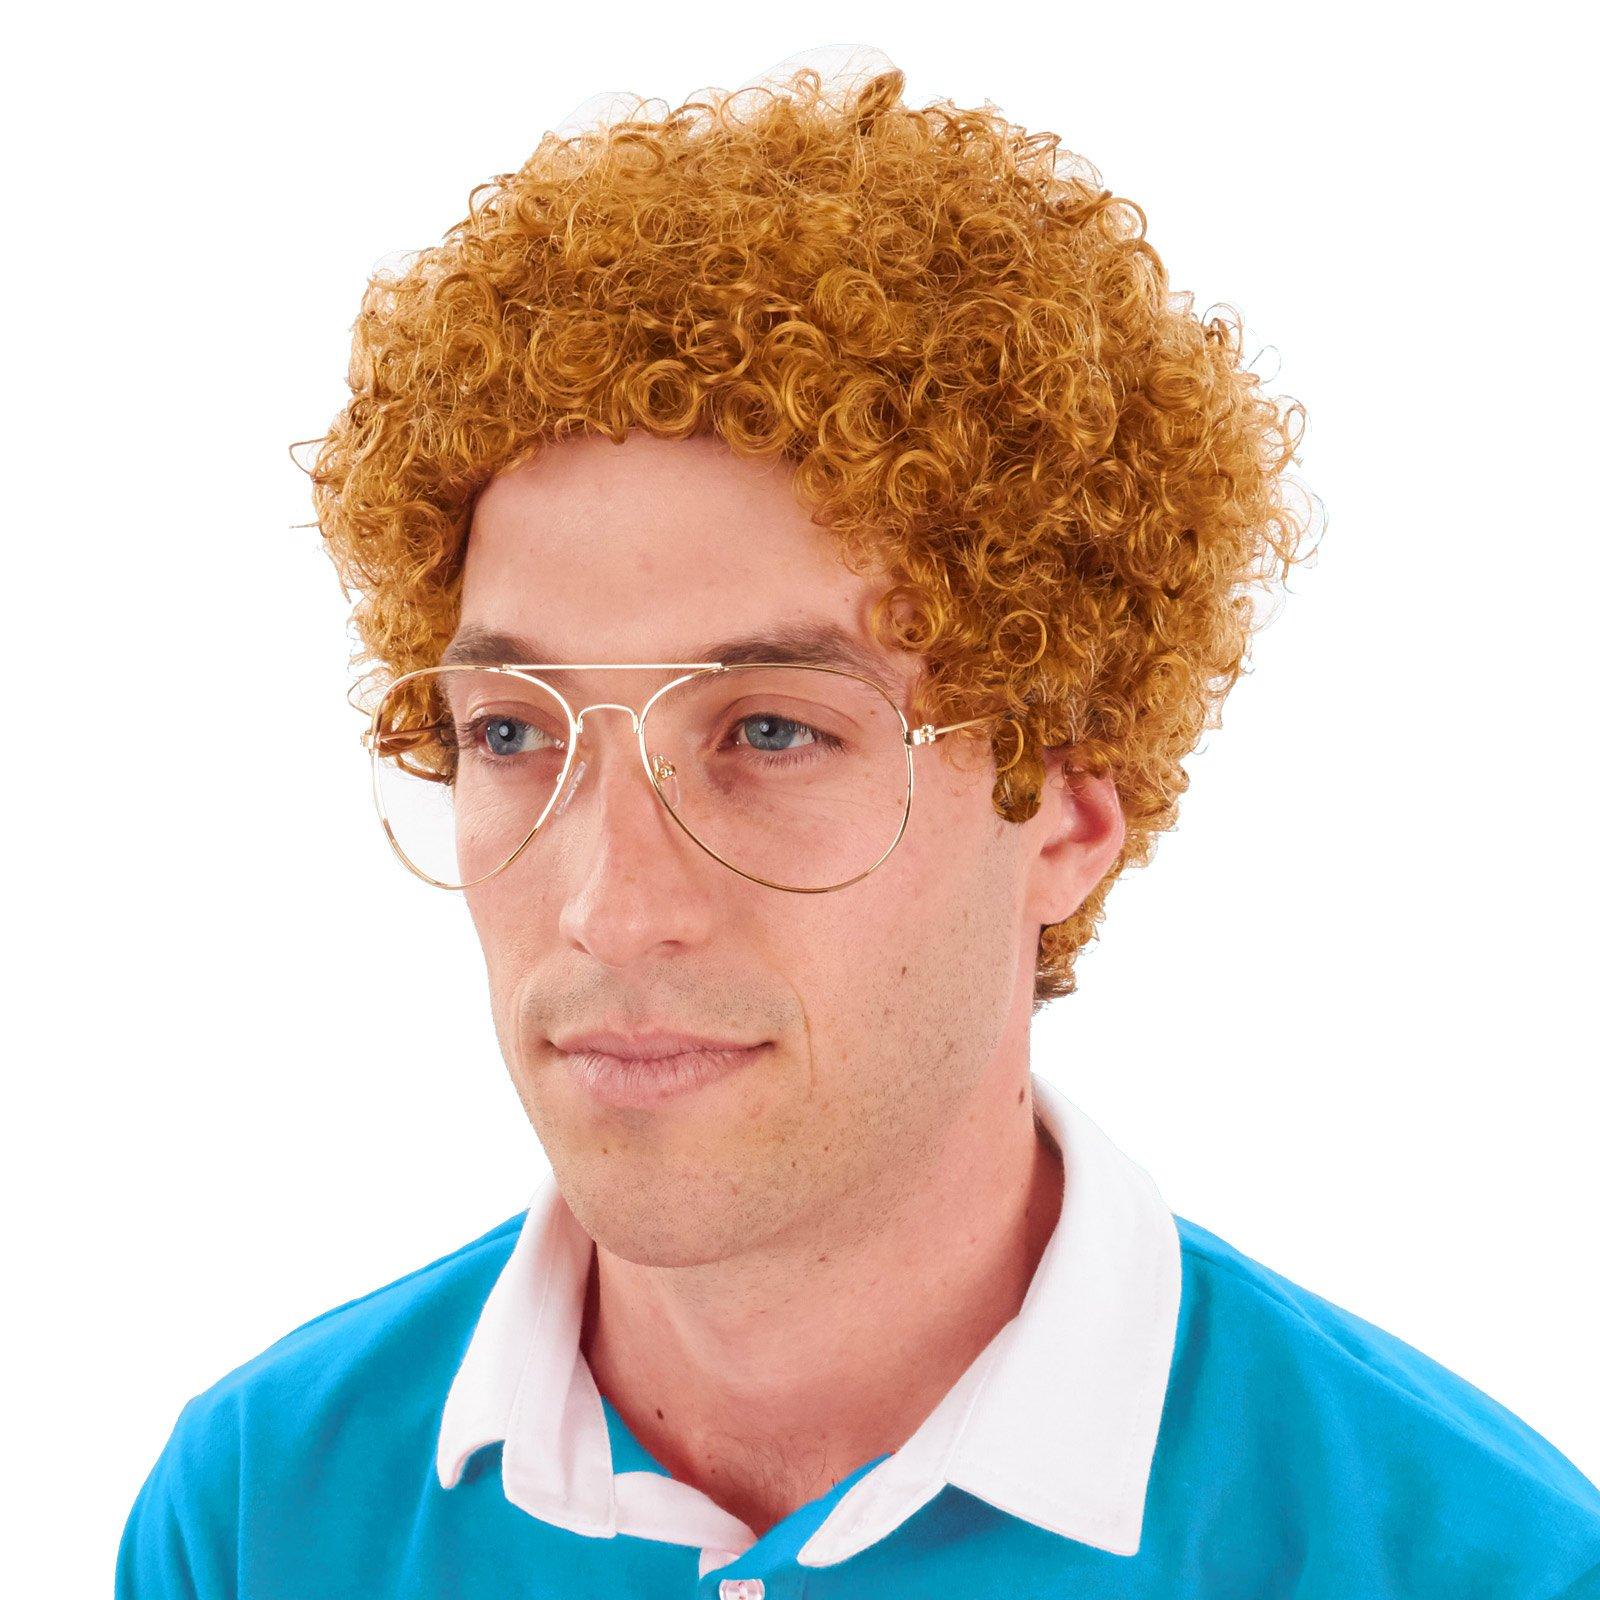 Largemouth Sweet Nerd Geek Costume Wig and Glasses Kit (Strawberry Blond)